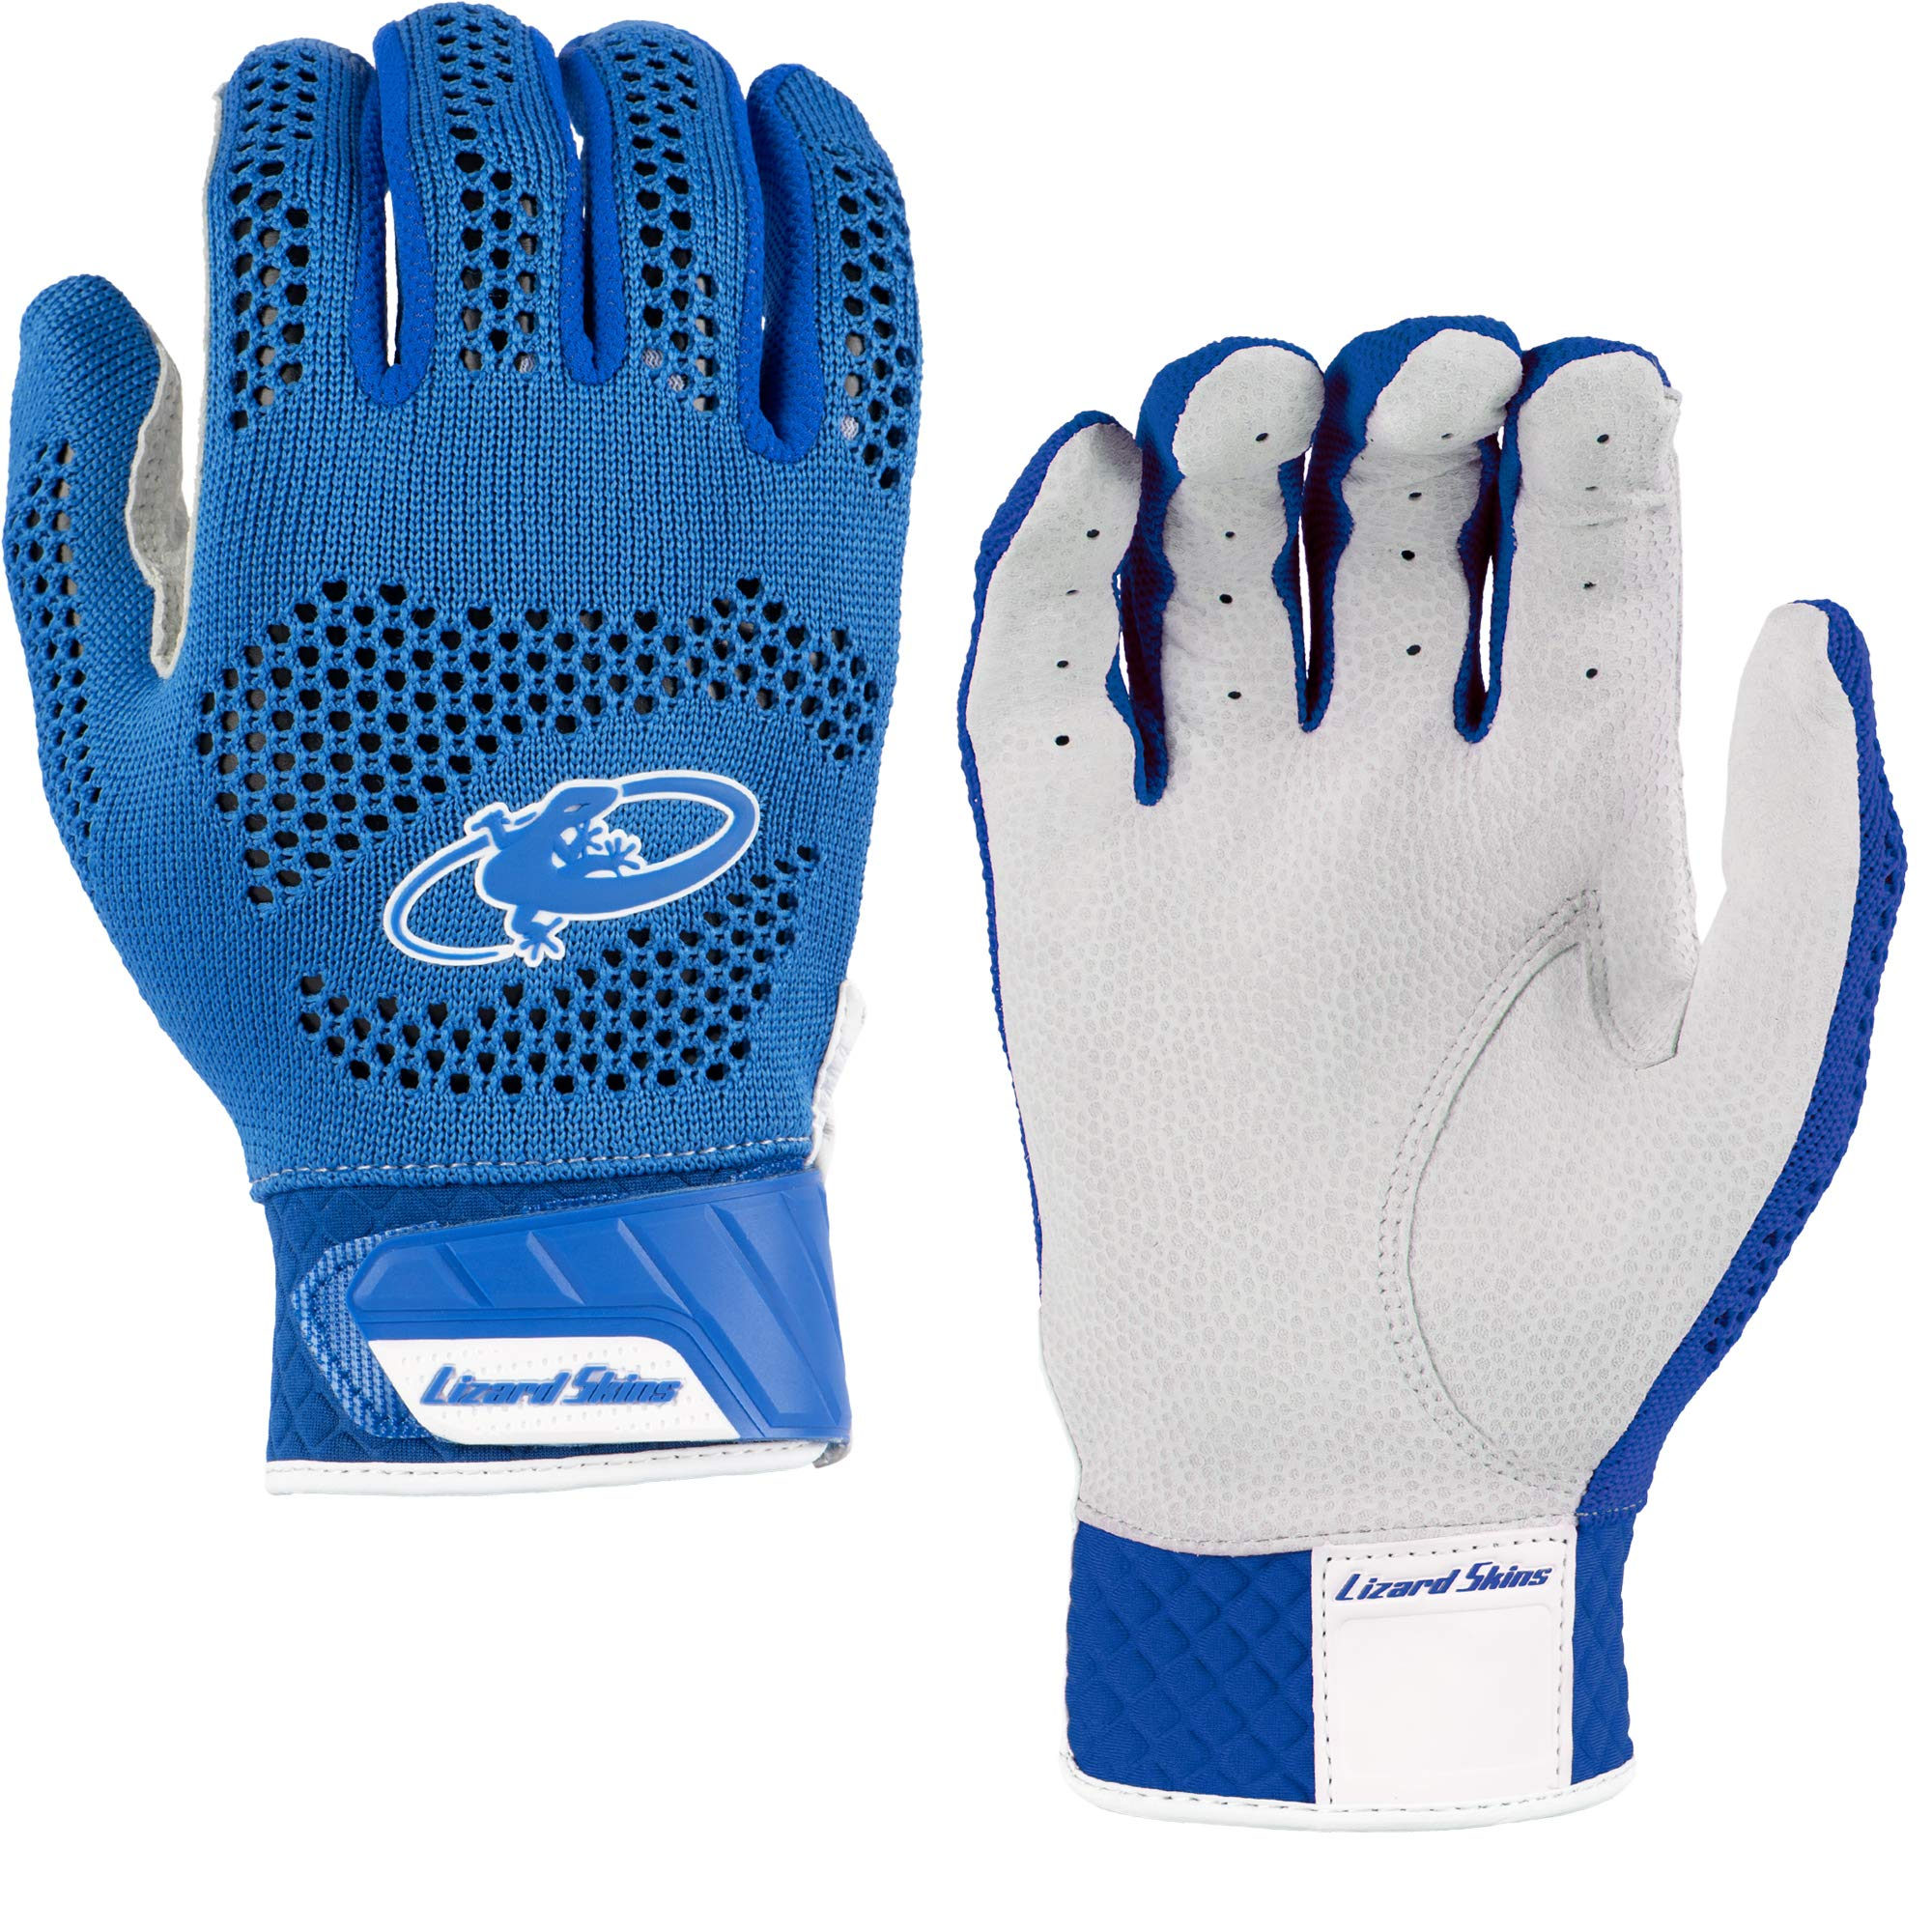 Lizard Skins Pro Knit 2.0 Baseball Batting Gloves - Adult Baseball Batting Gloves (Blue, X-Small)